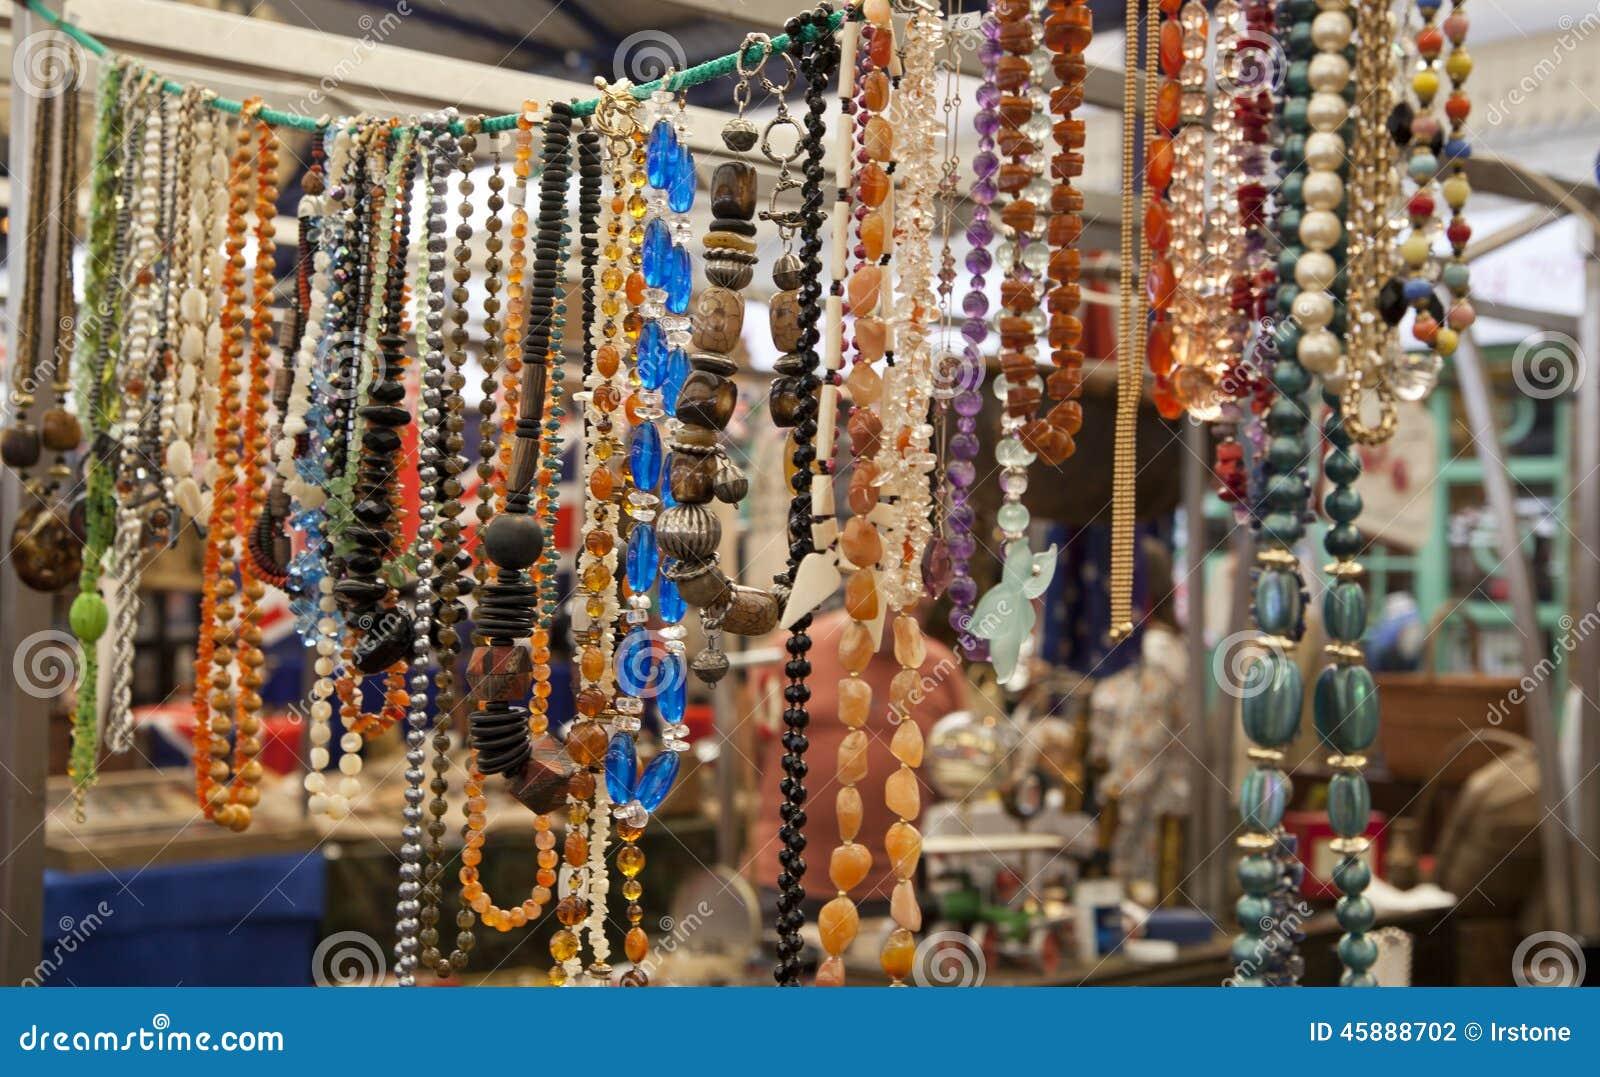 Buy Art Crafts London Uk